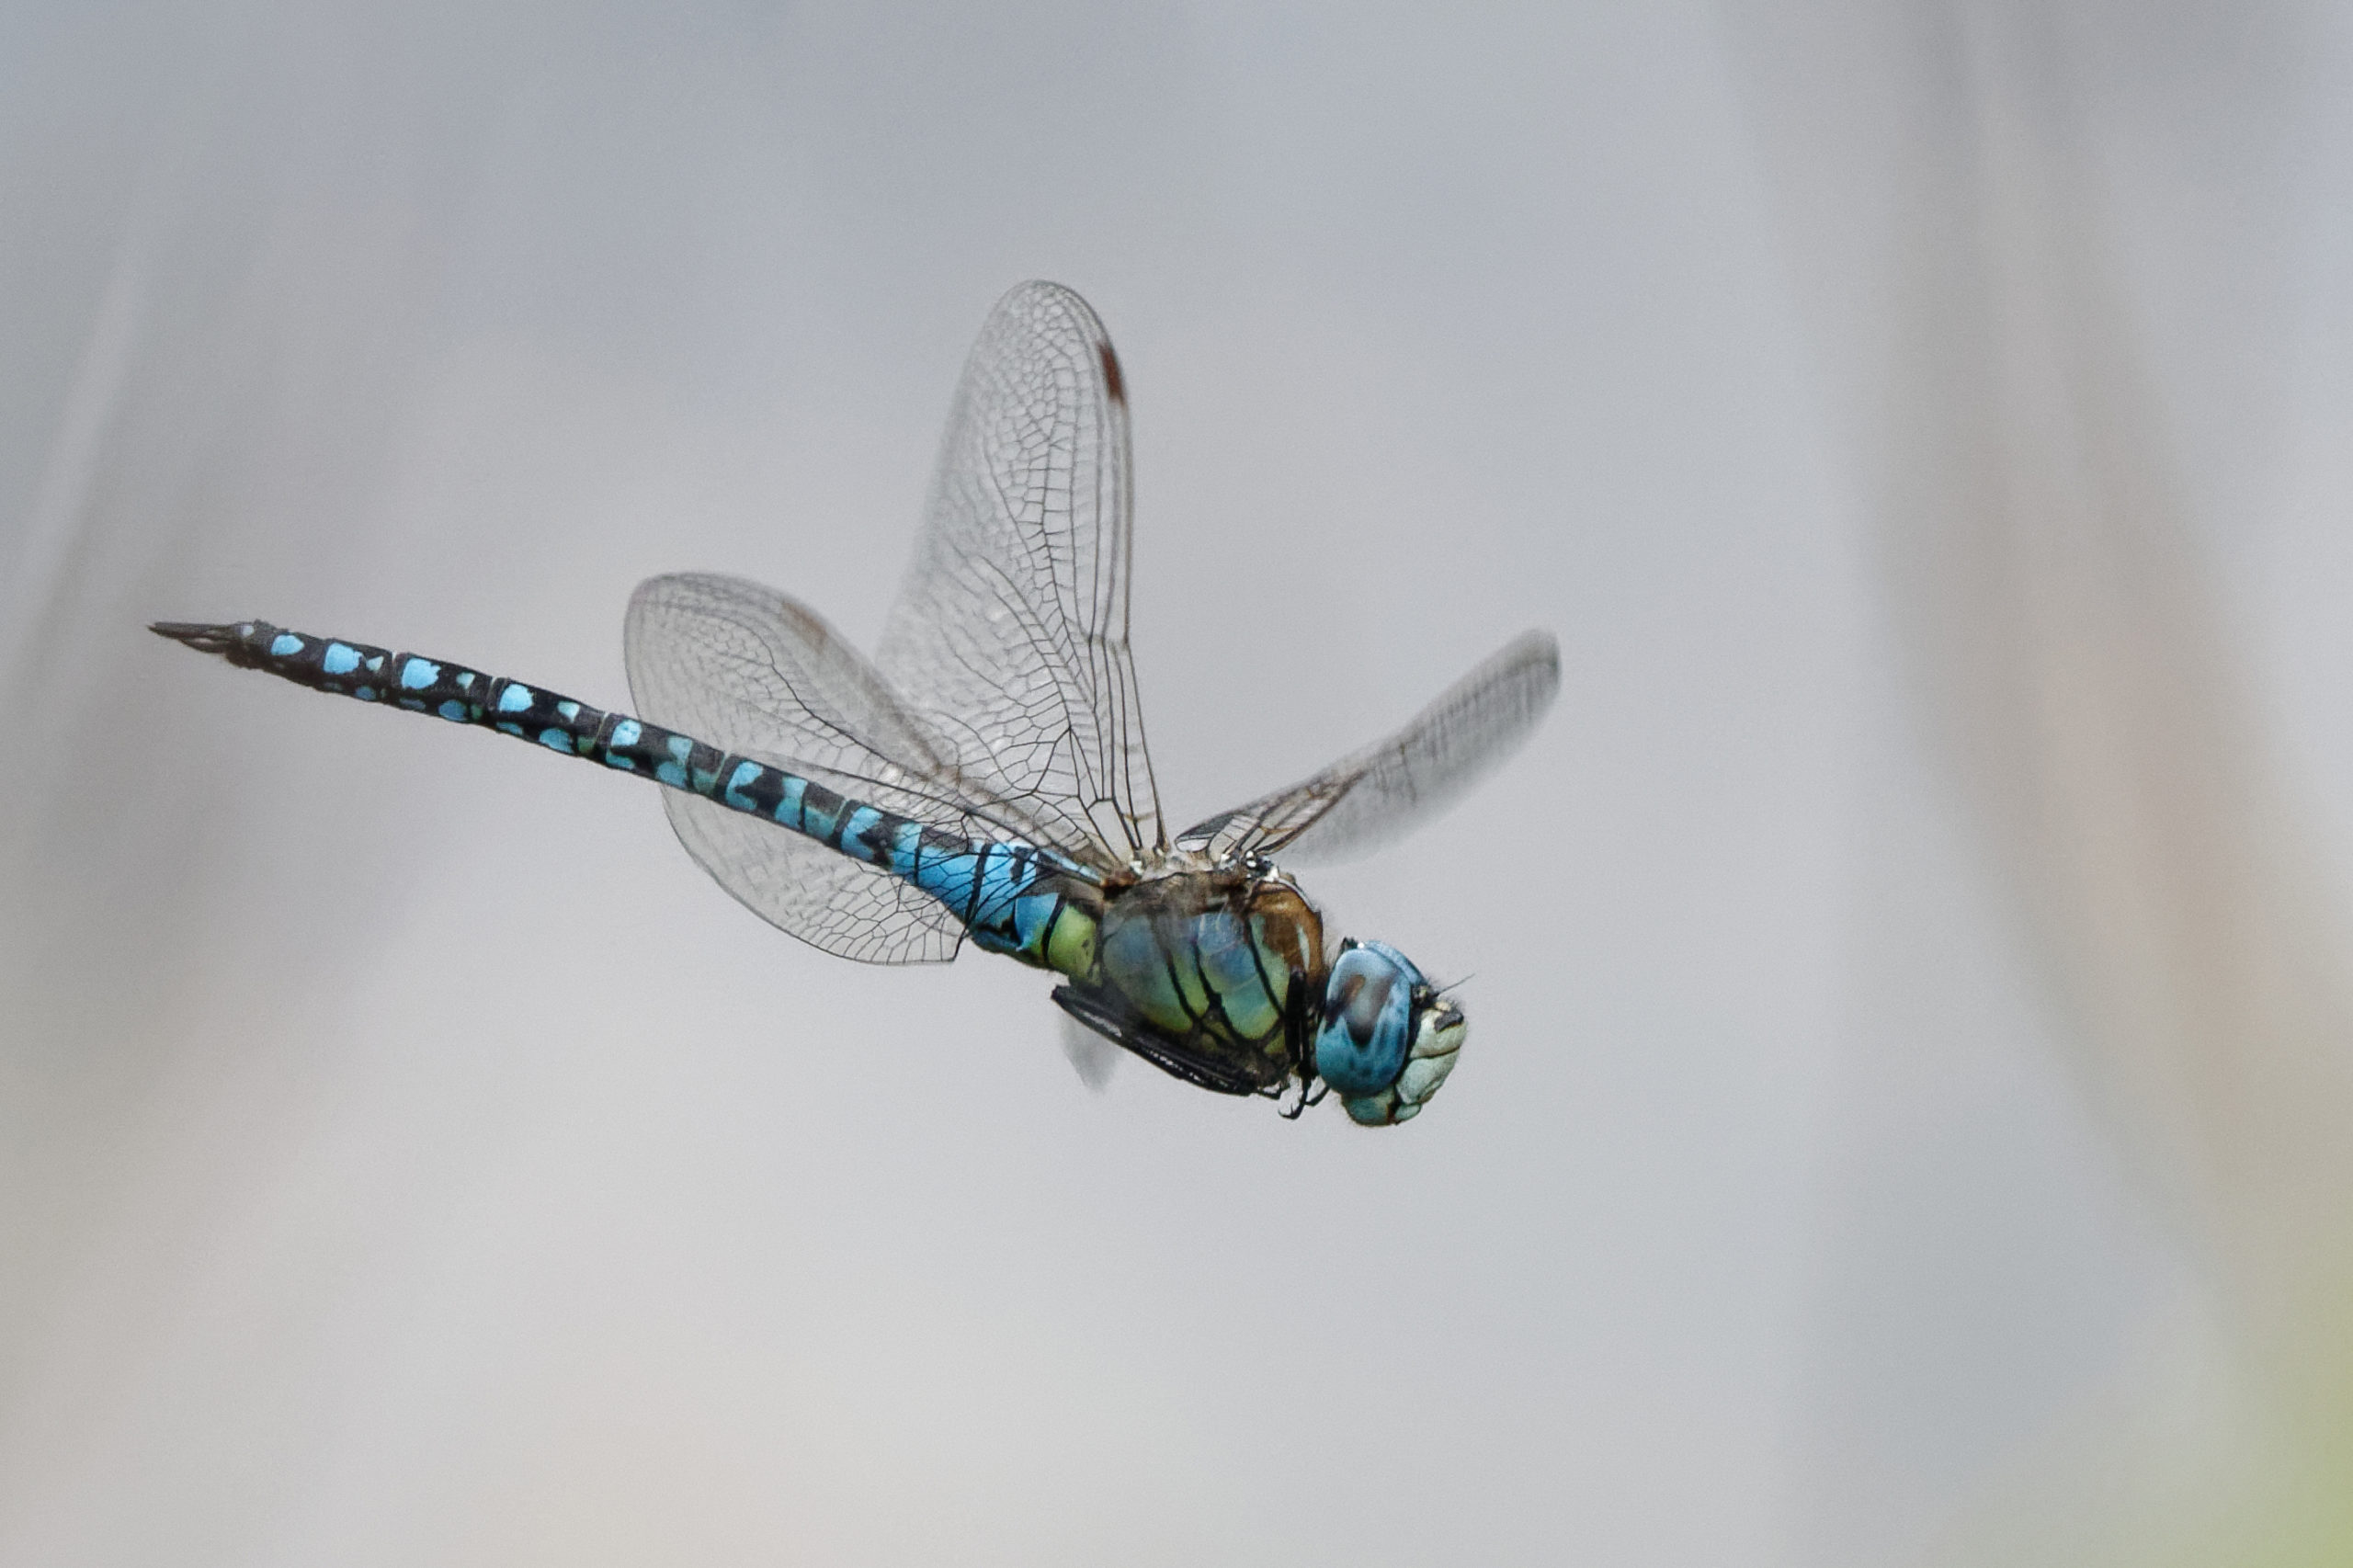 2019-08-aeschne-affinis-2